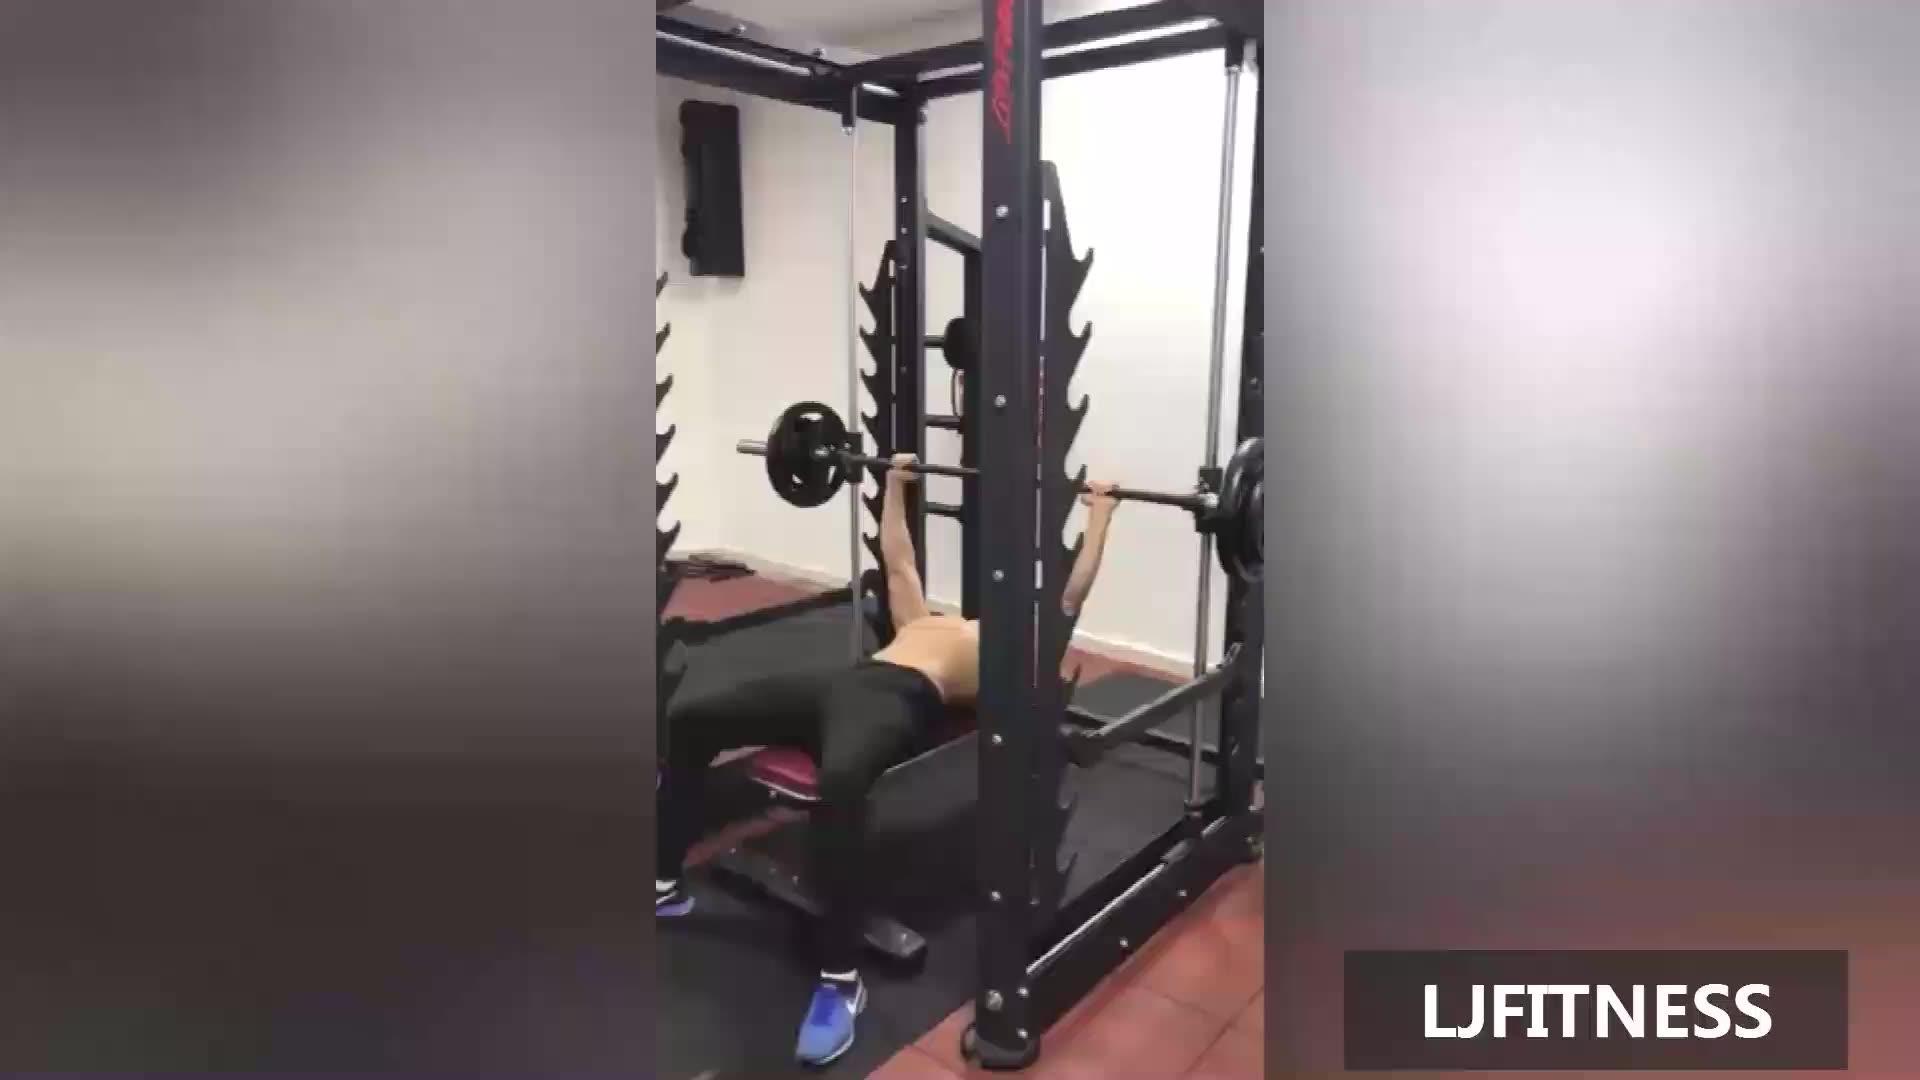 LJ-5535C 3D smith machine